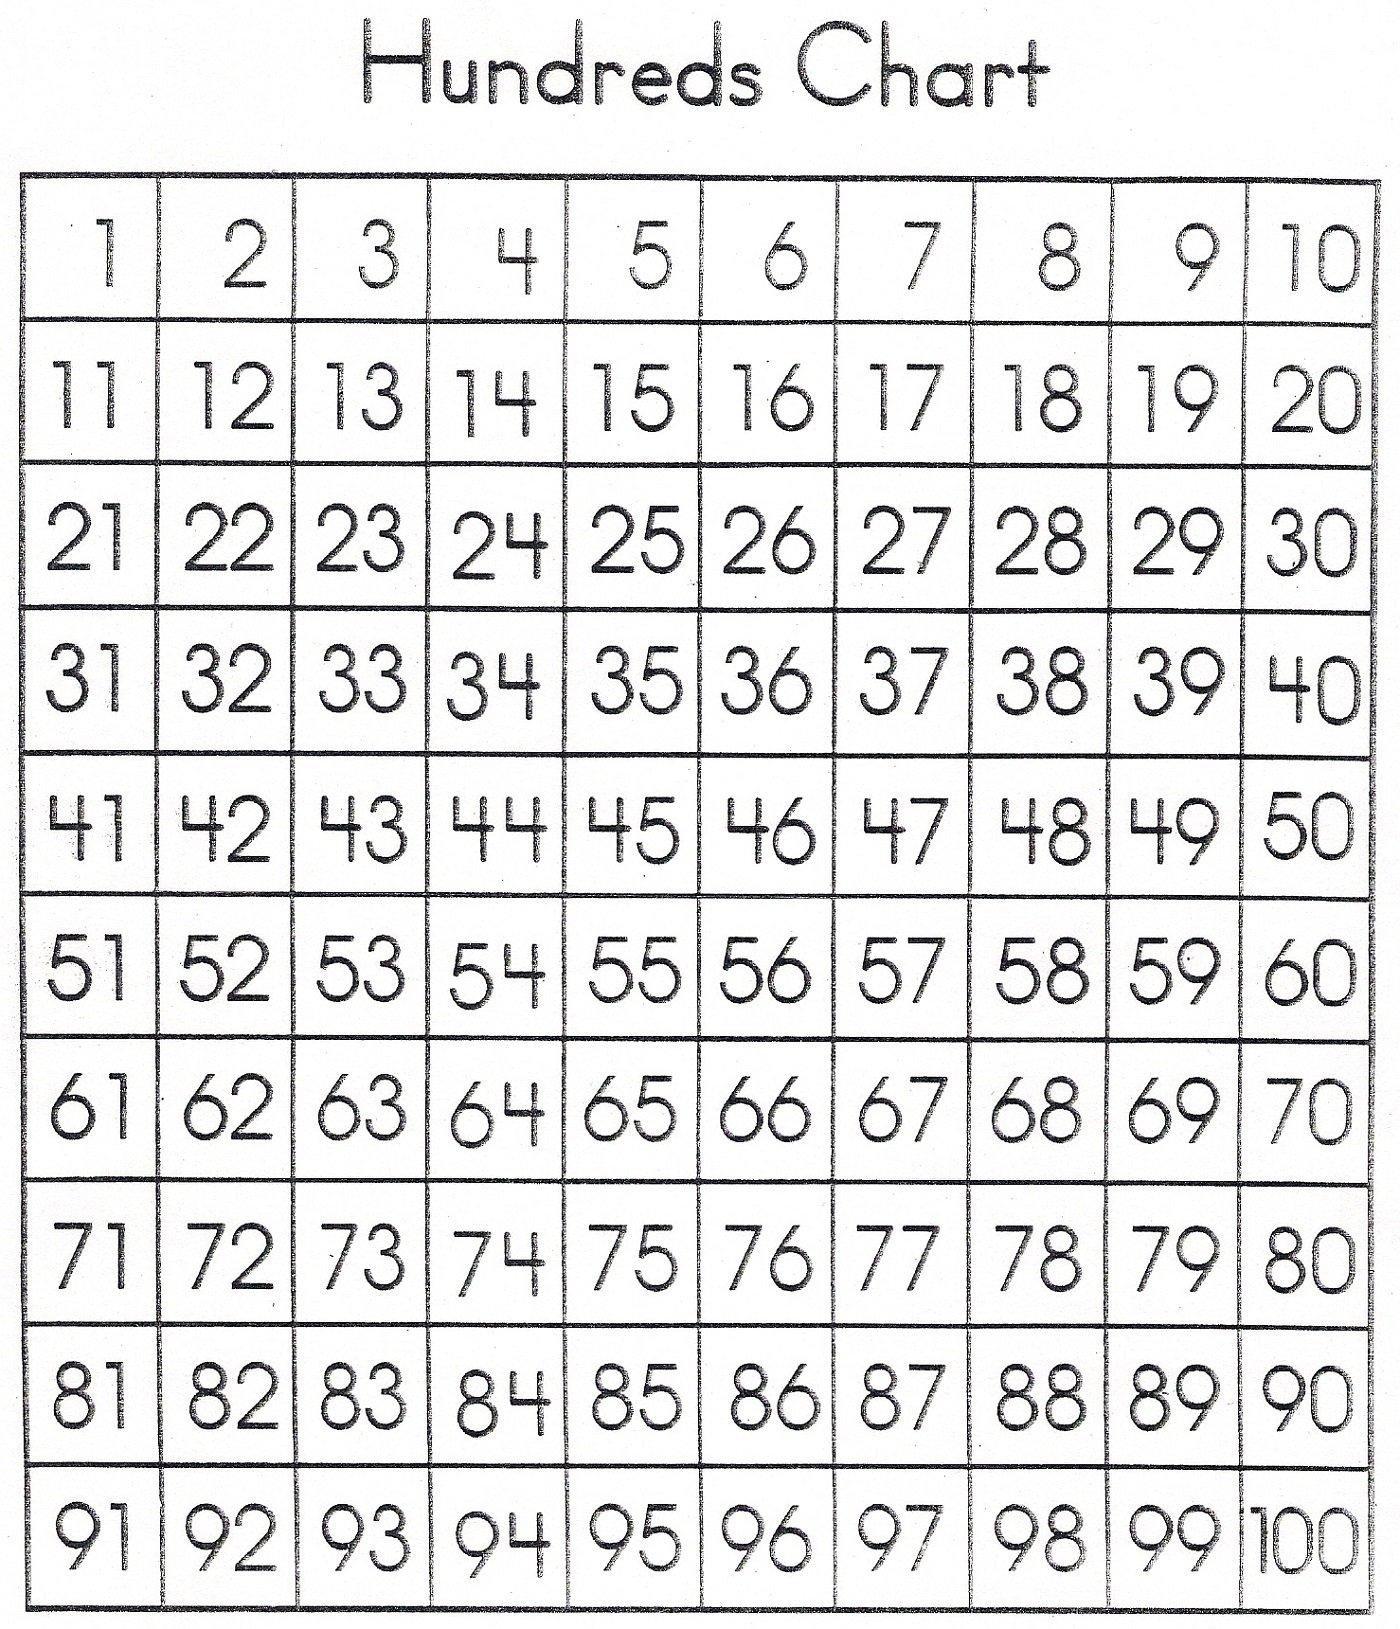 1-100 Number Chart Printable | 101 Printable Free Number Charts 1-31